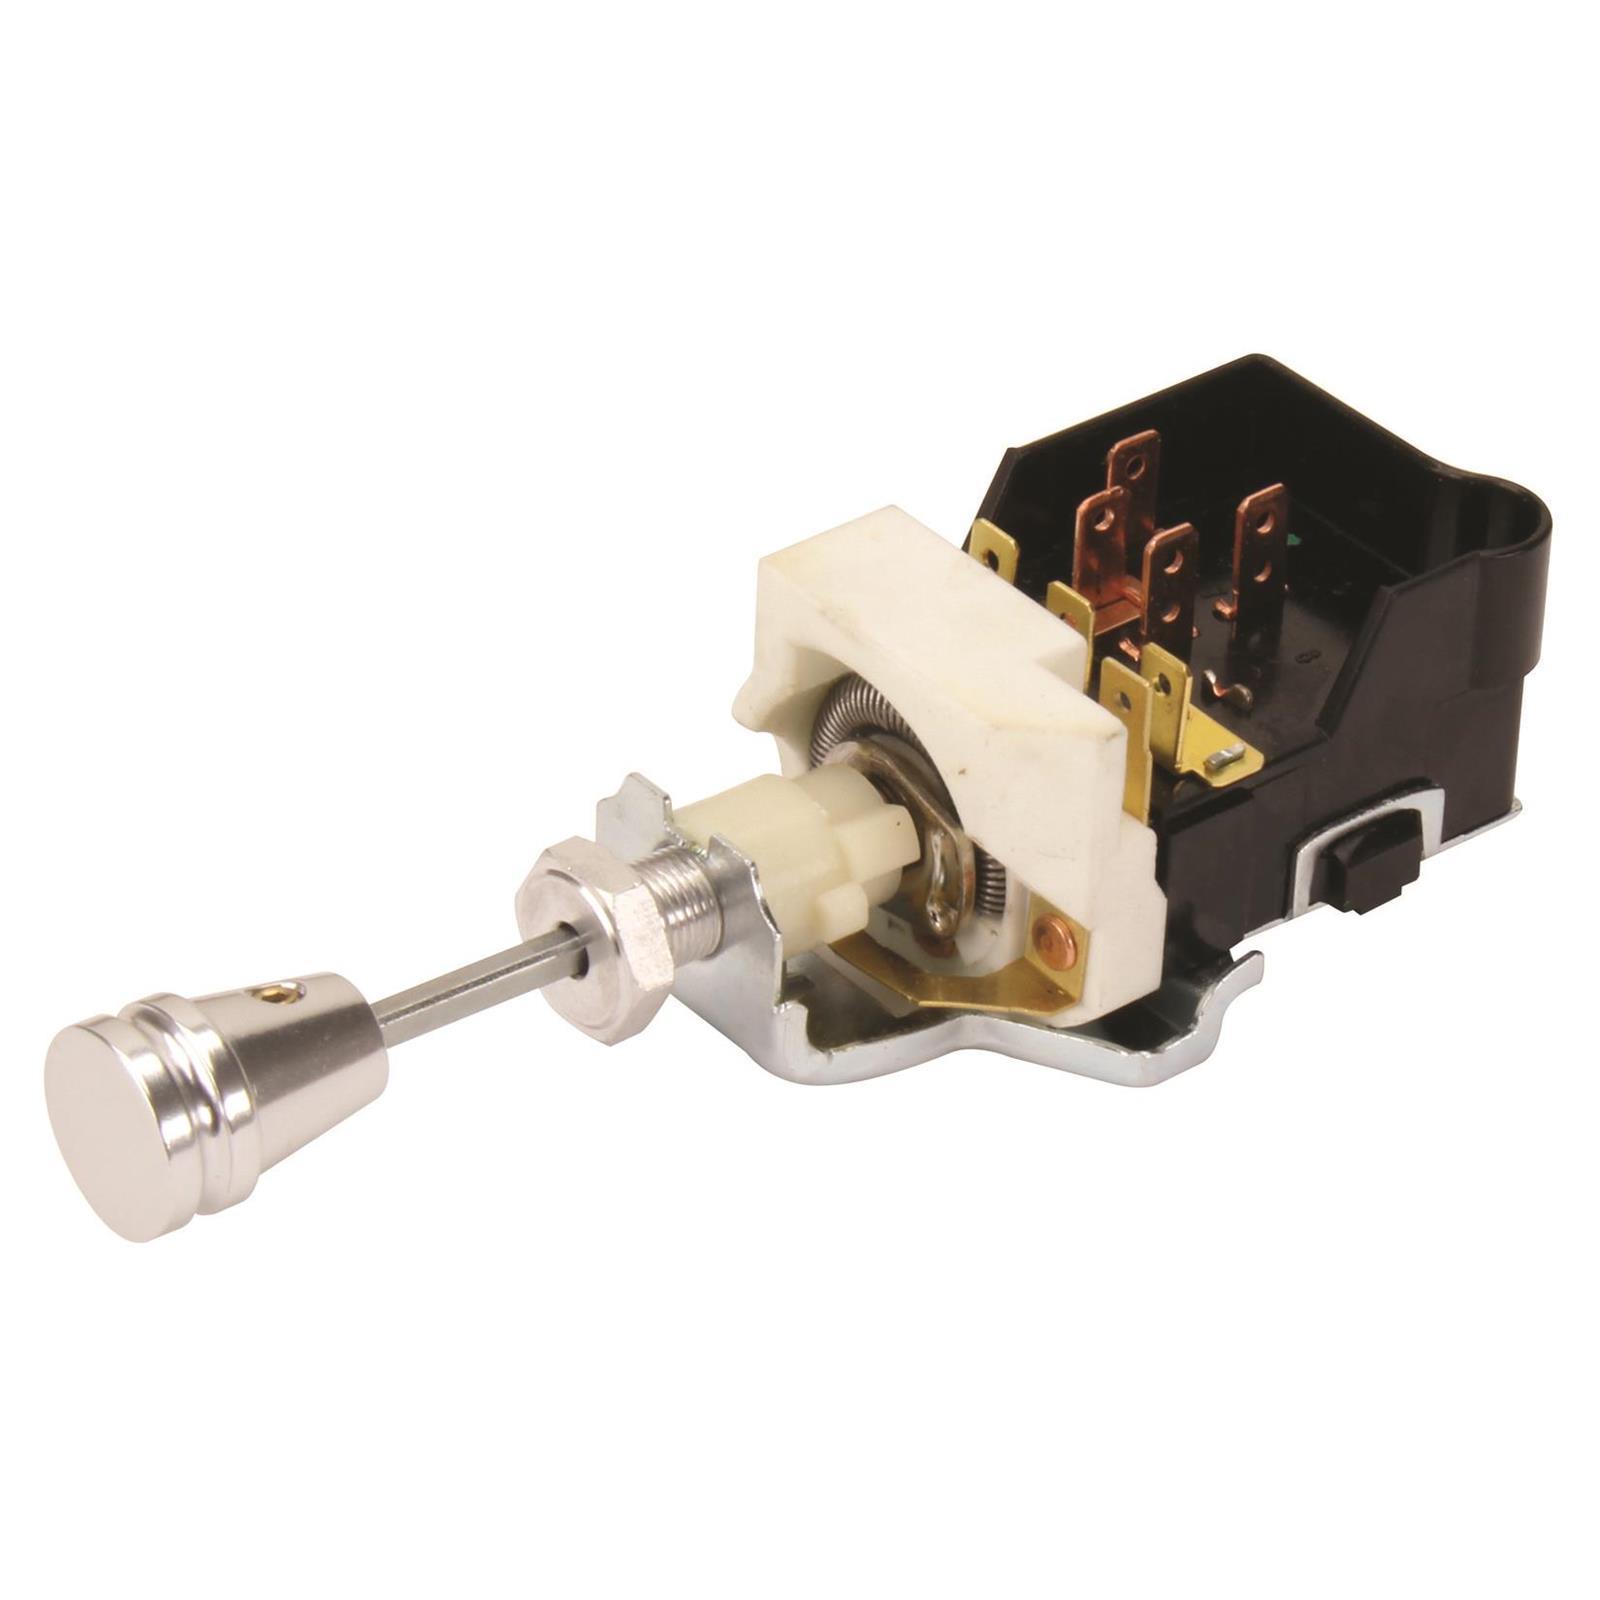 Gm Style Billet Street Rod Headlight Switch 67 Camaro Rs Wiring Diagram Limit